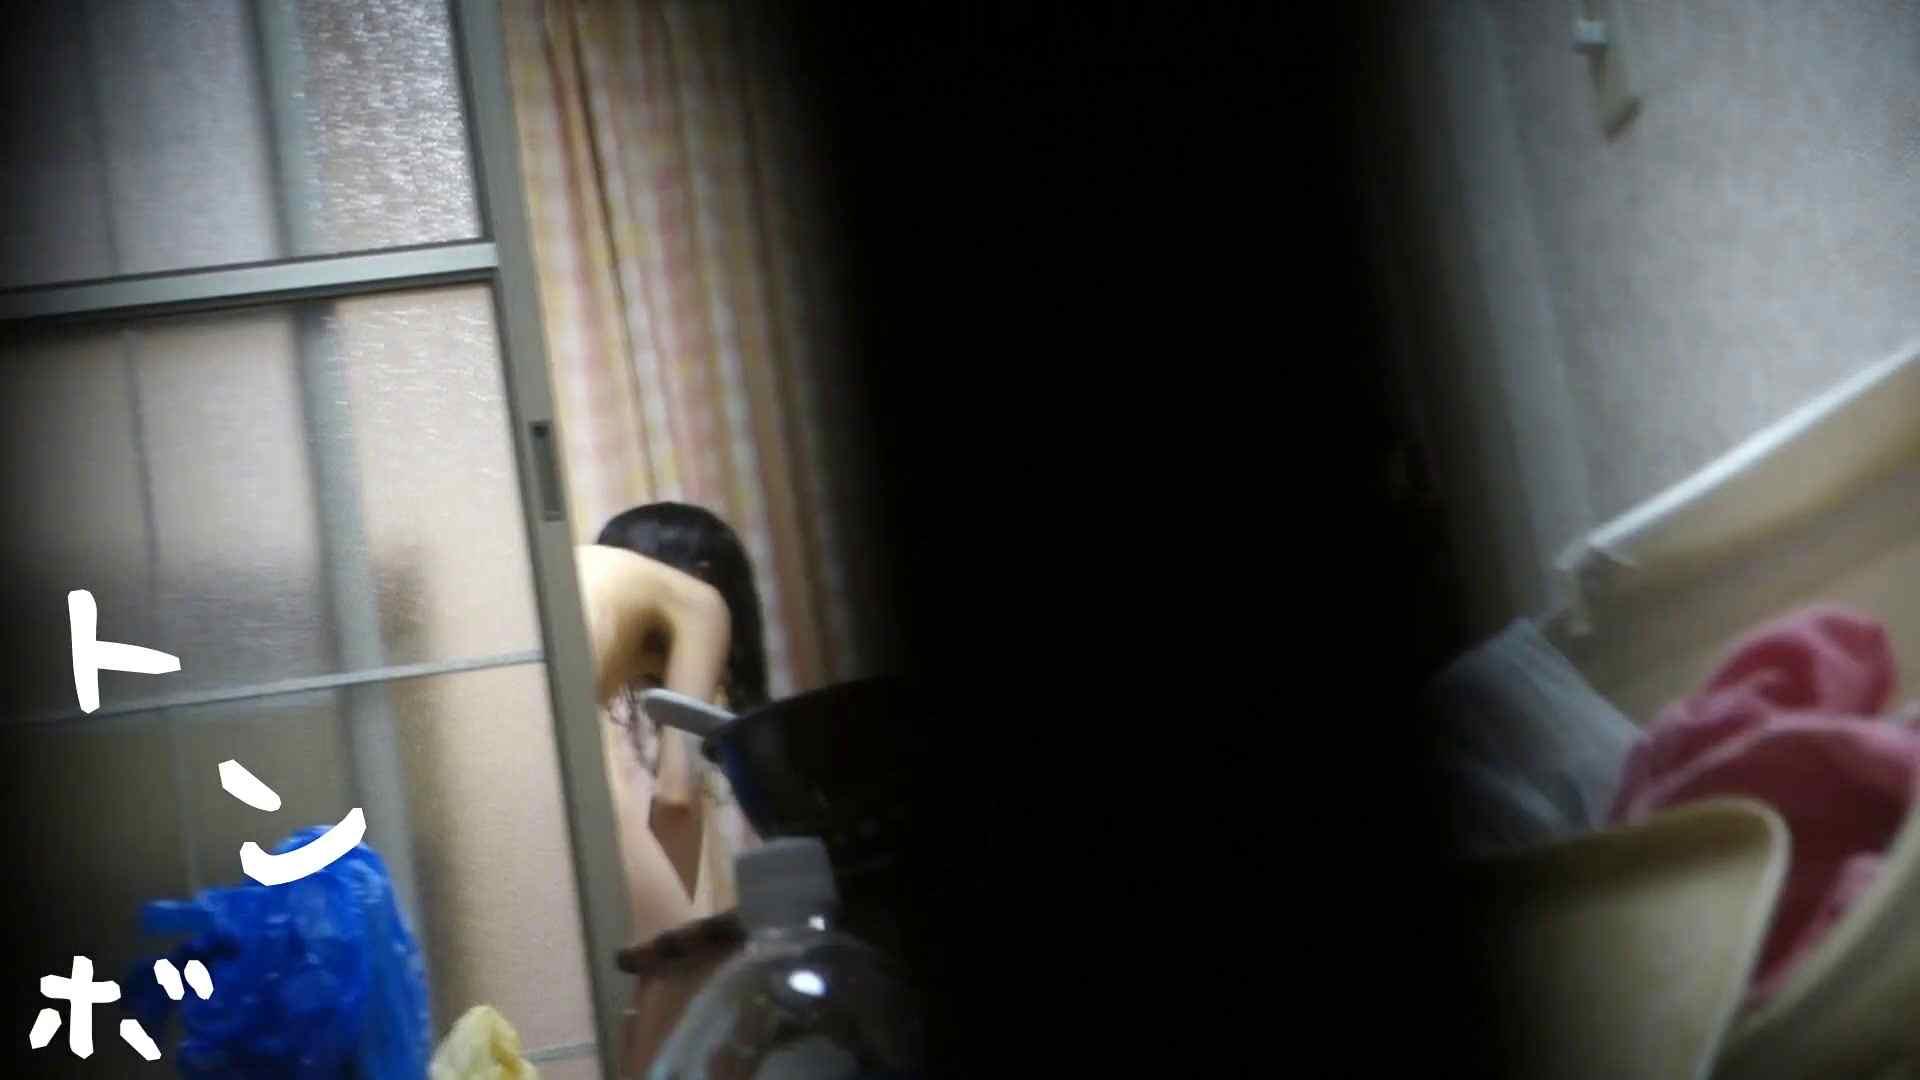 リアル盗撮 現役女子大生の私生活③ 細身  104PIX 89